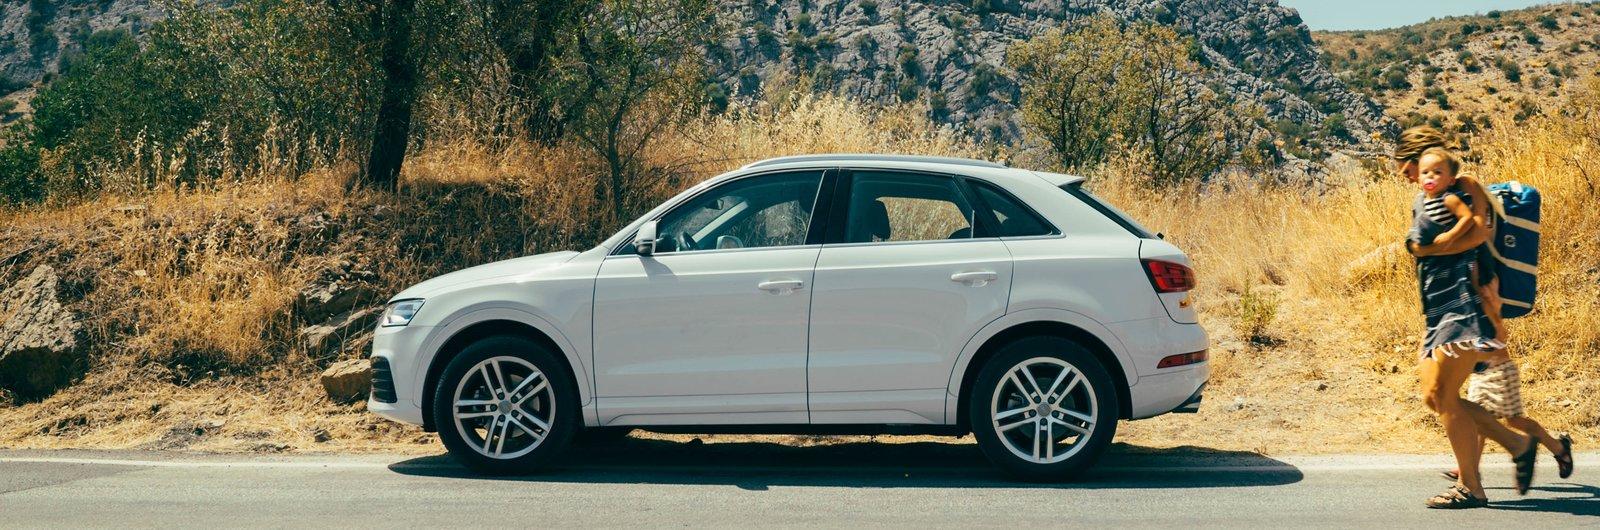 Family Car Rental Sixt Rent A Car